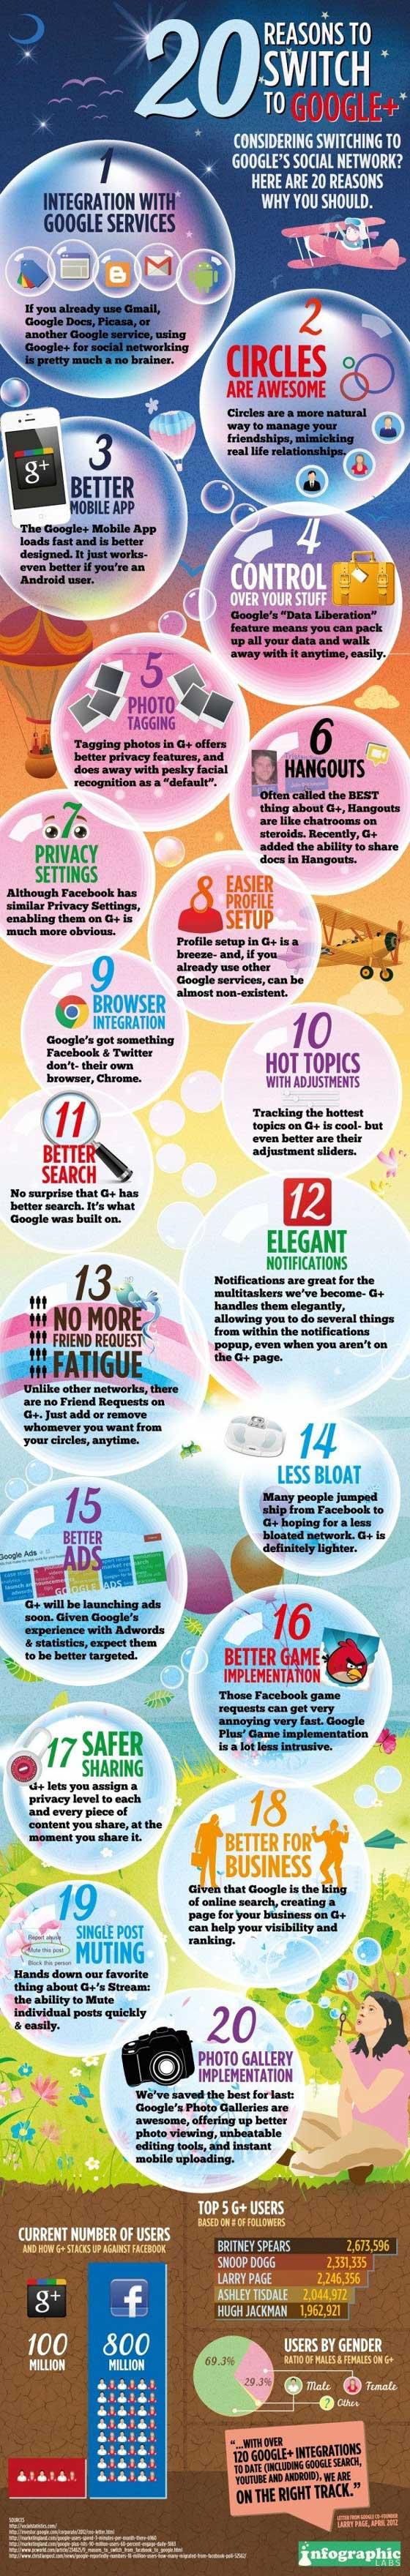 raisons-utiliser-Google-plus-infographie